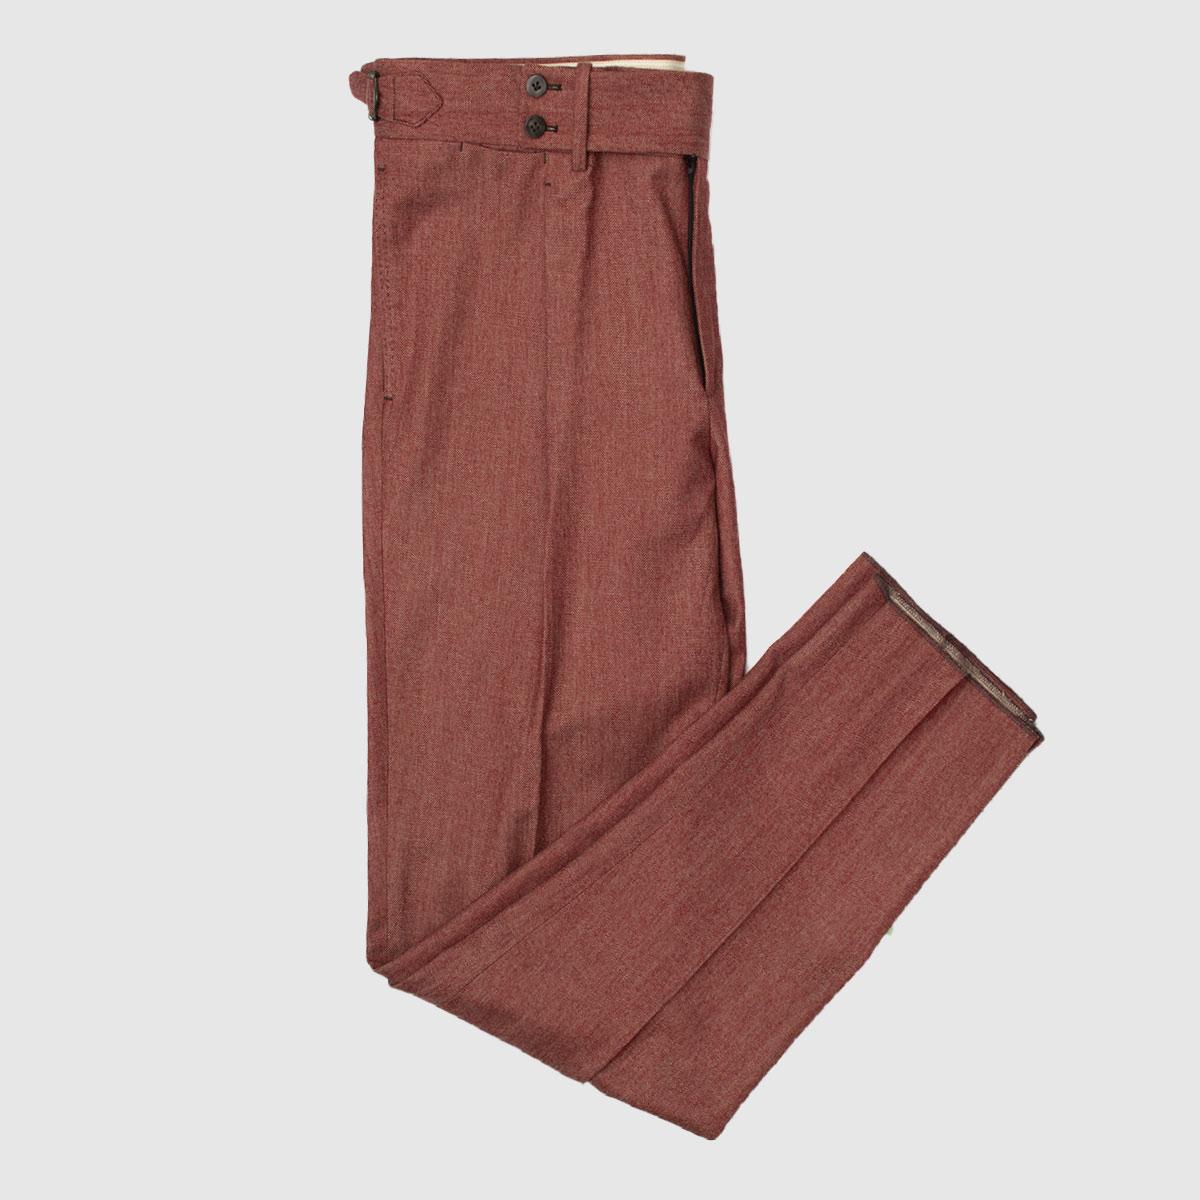 Pantalone burgundy in Lana single pience